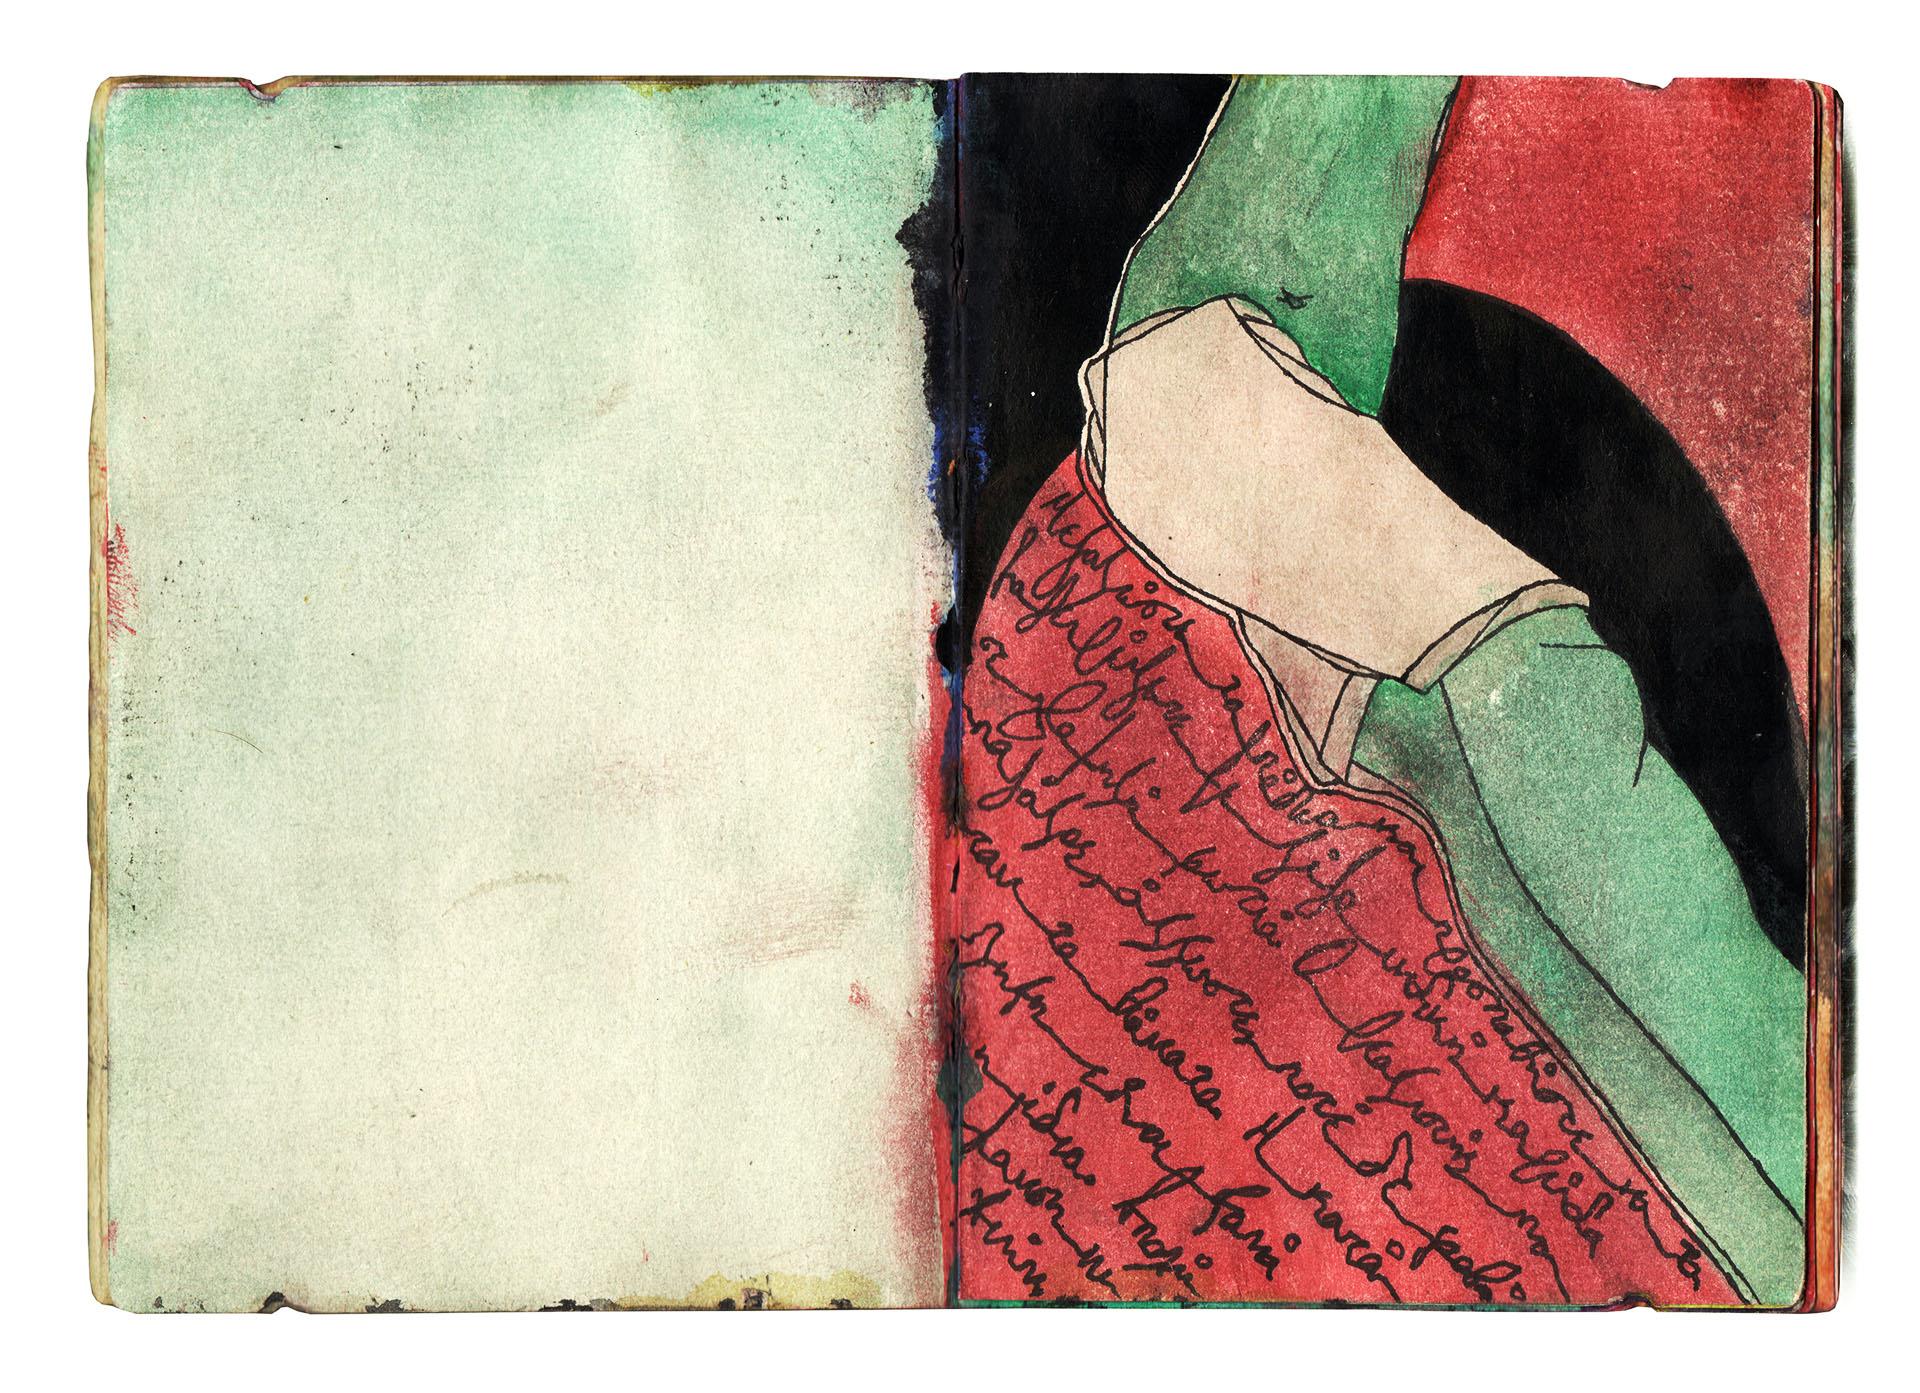 project sketchbook 02